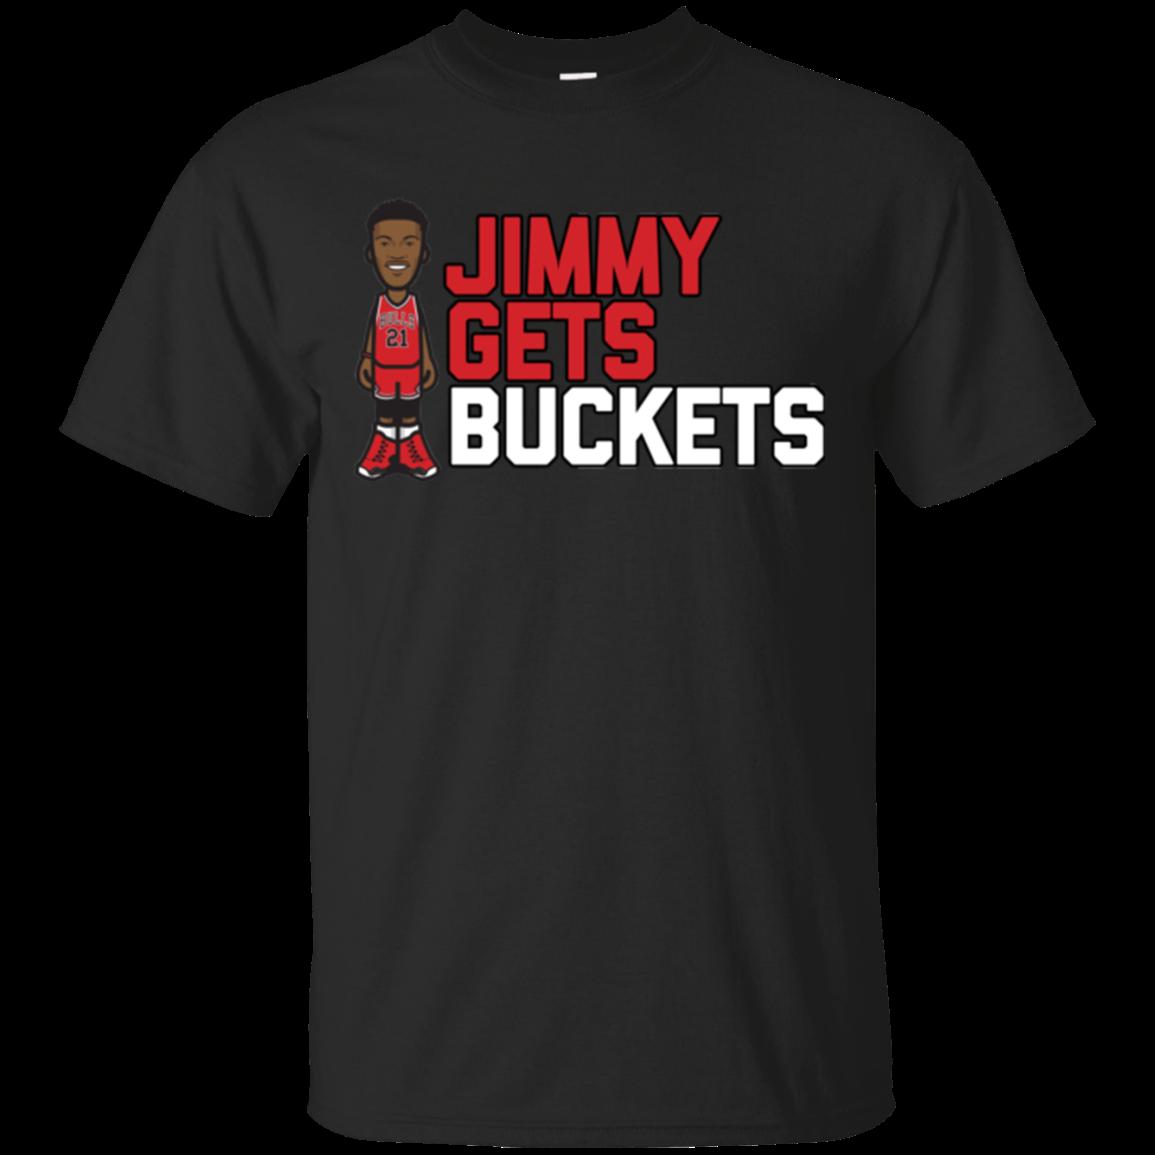 Jimmy Butler Jimmy Gets Buckets XL Black Tshirt Hoodie